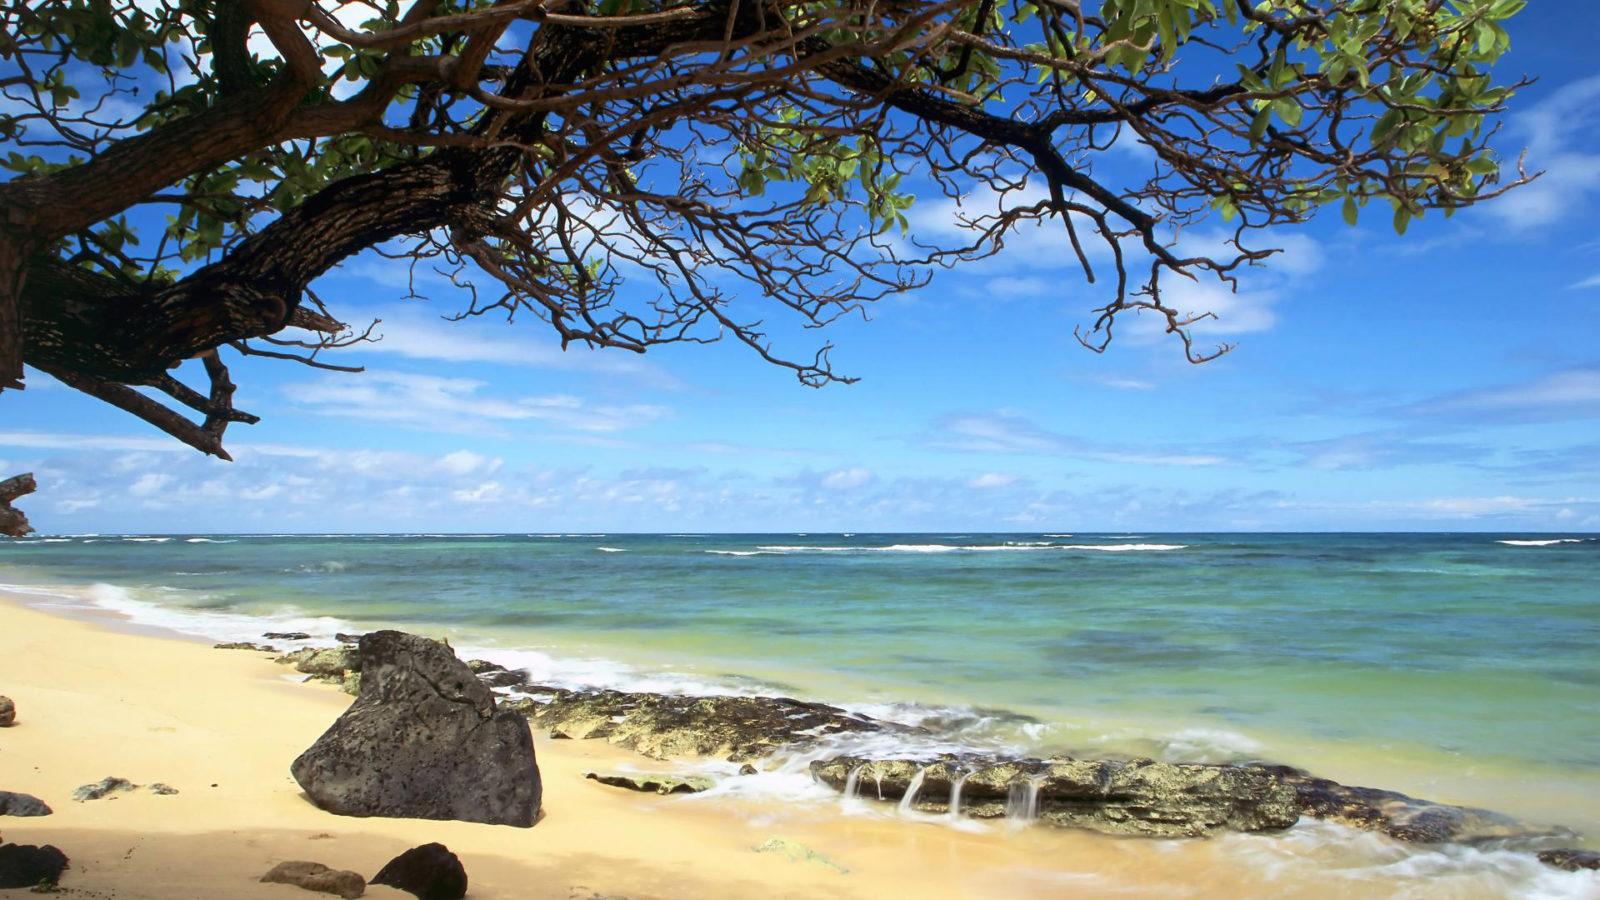 Beach Wallpaper Desktop Background 66 1600x900 129 Examples To